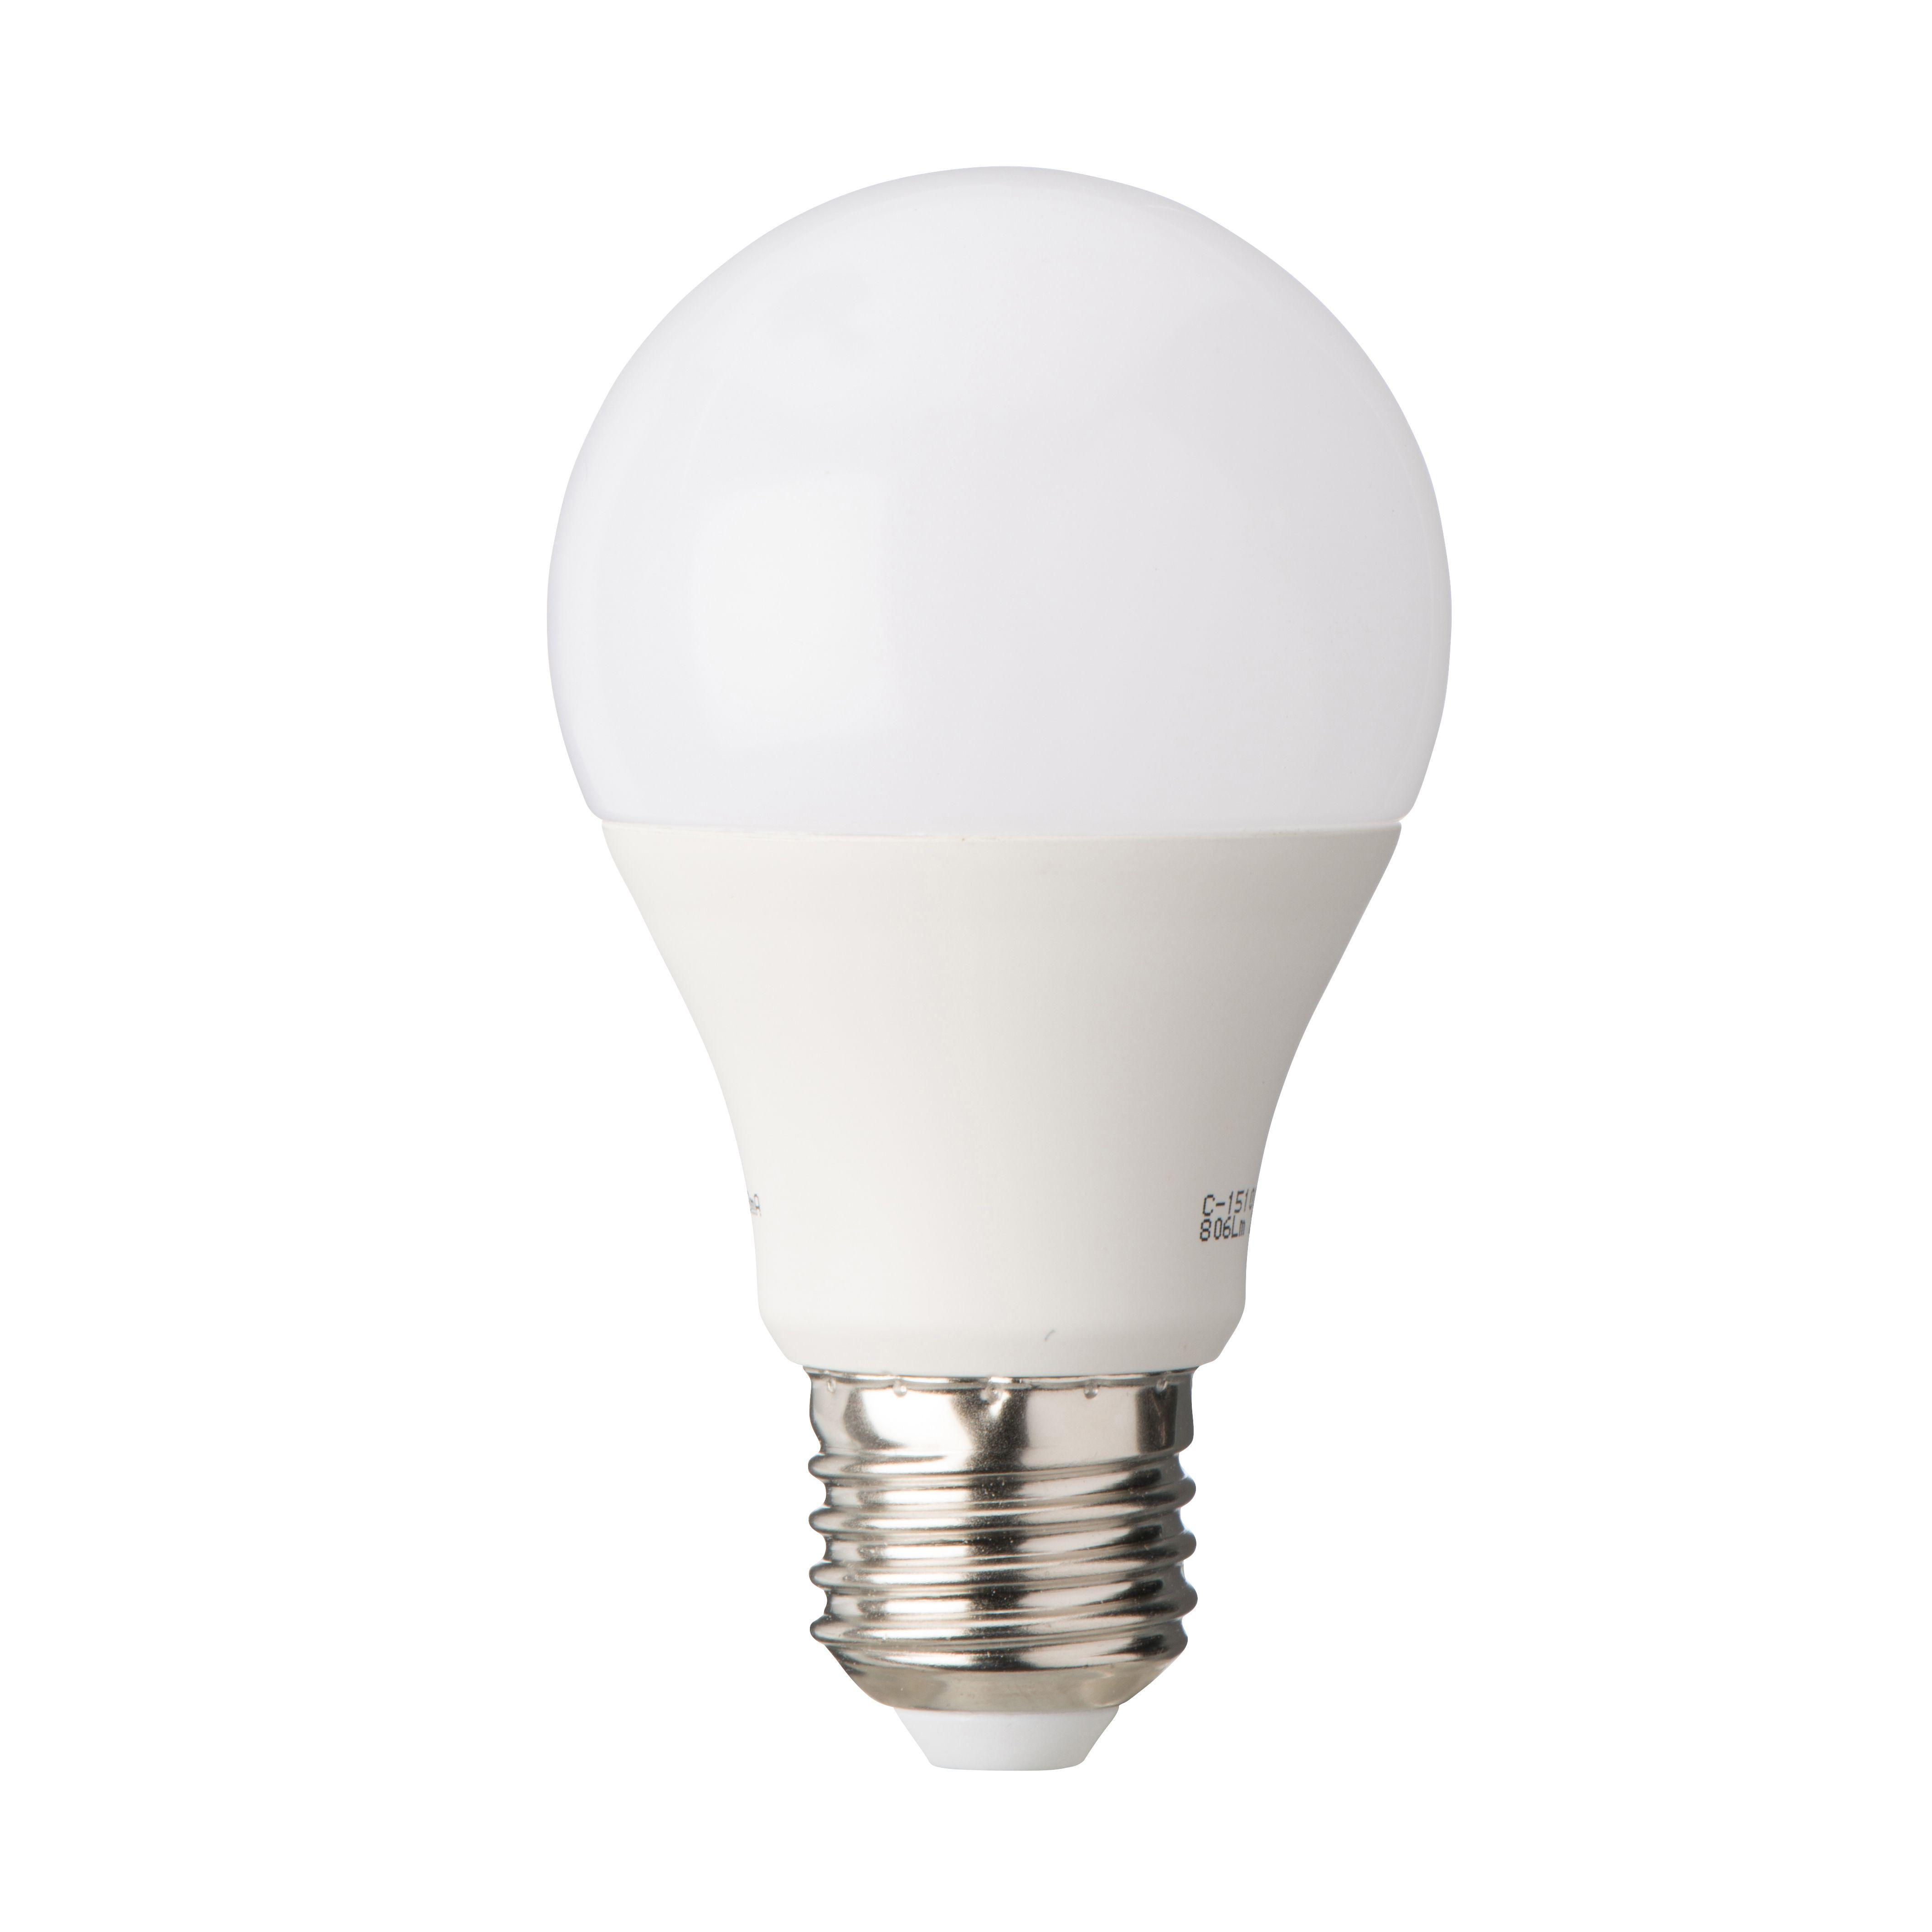 Diall E27 806lm LED Classic Light Bulb